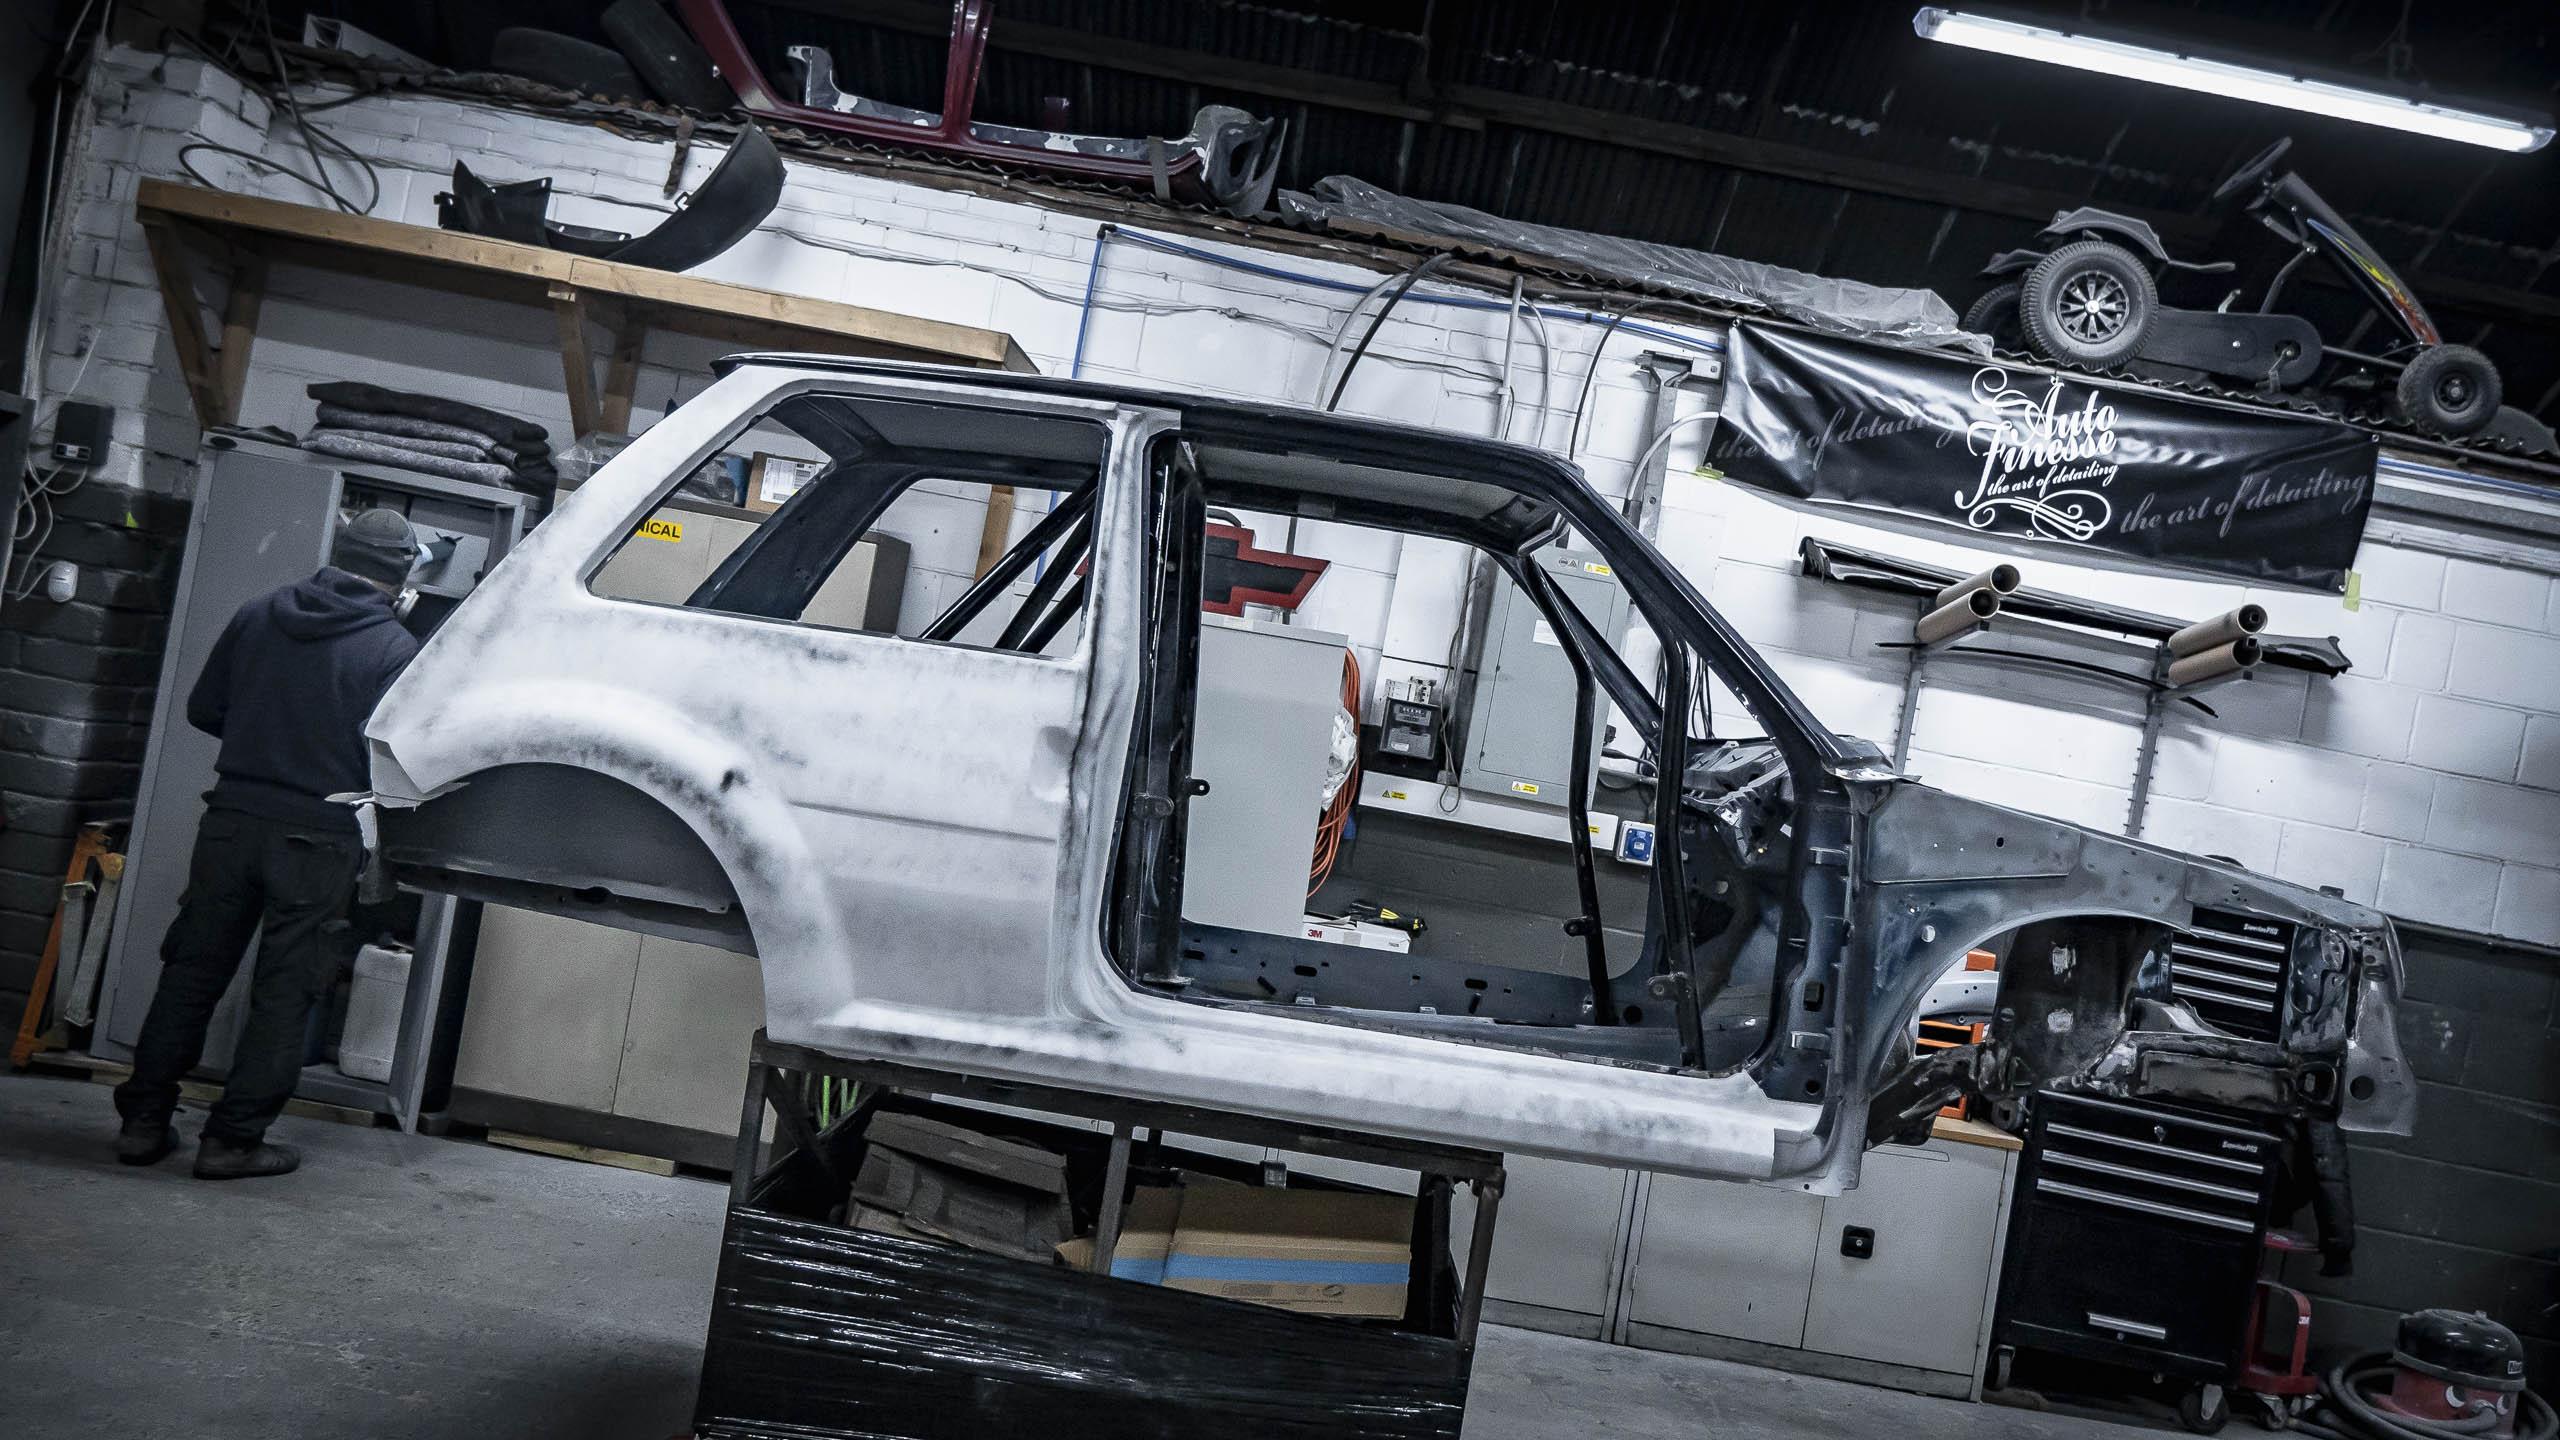 Retro Car Restoration Renault 5 Gt Turbo Build Car Build Sussex